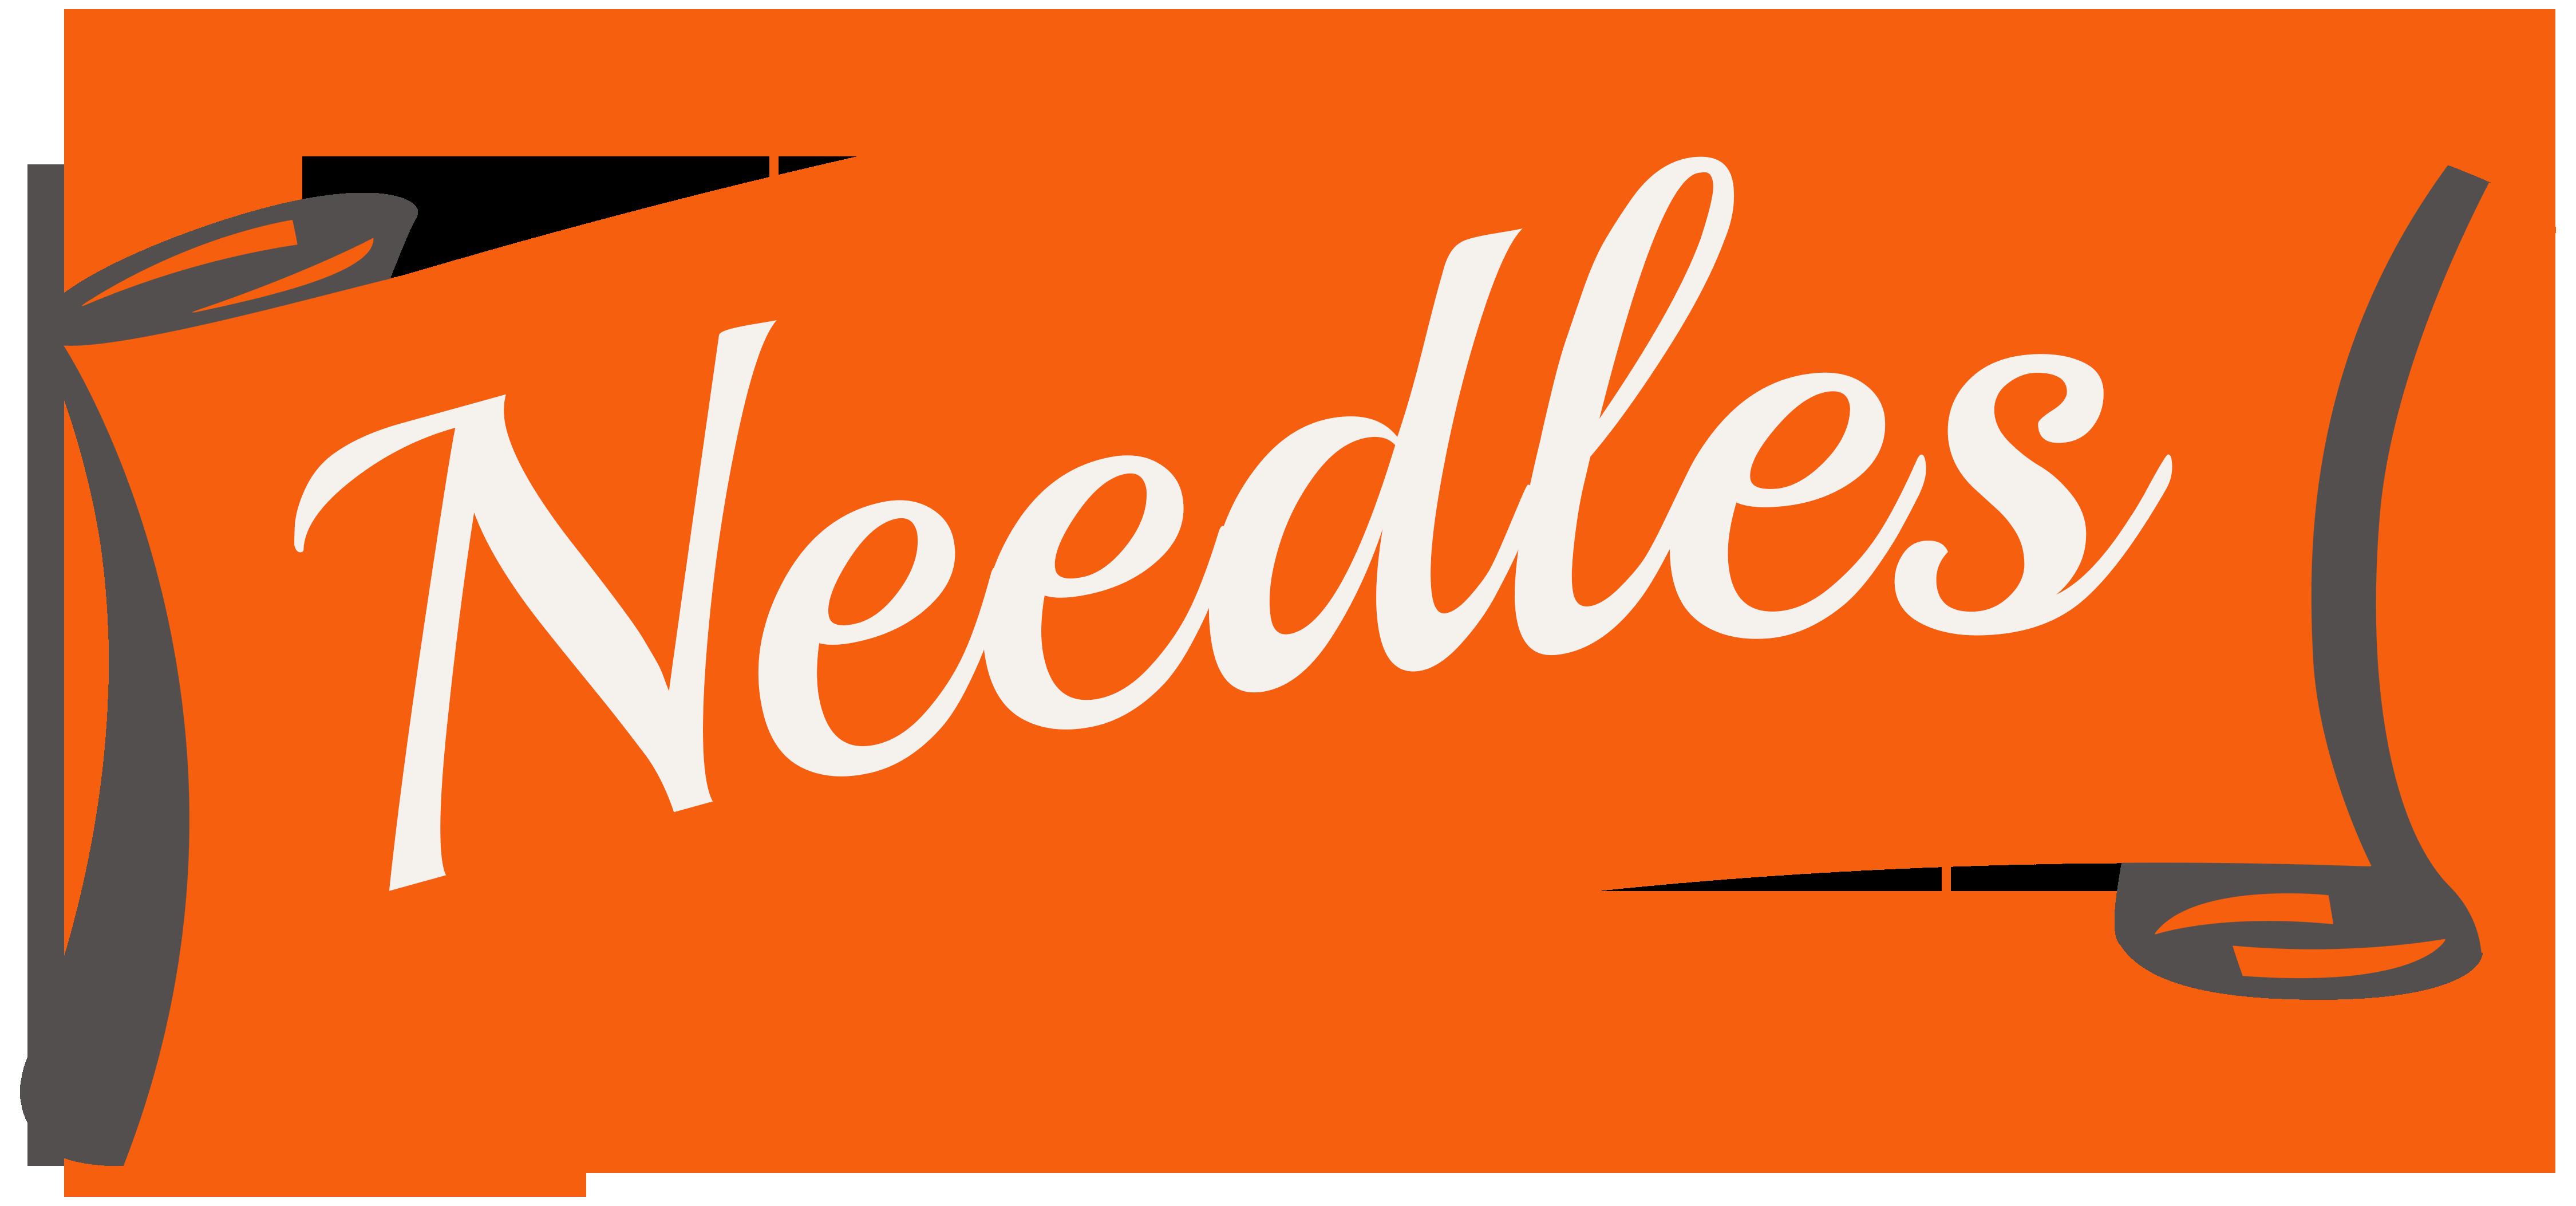 Lrg-Header-Products